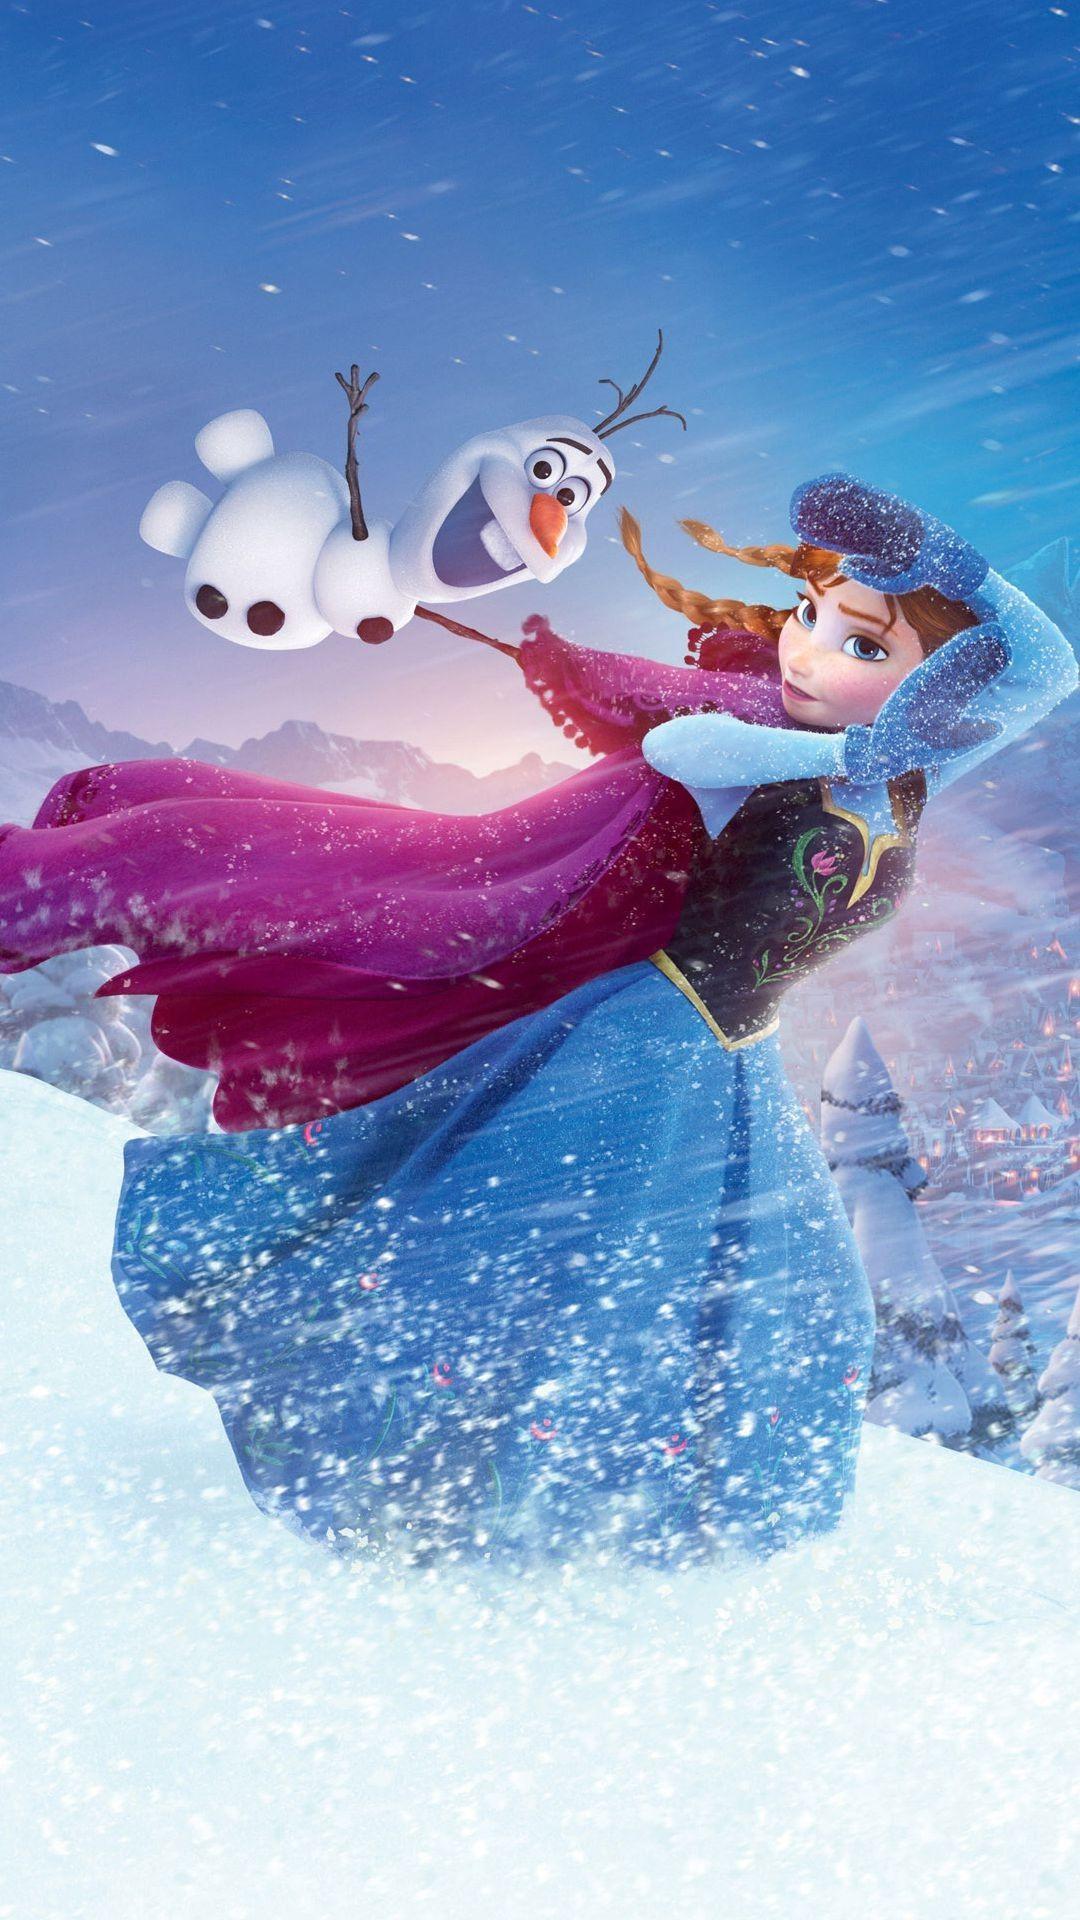 2014 Halloween Frozen Anna Olaf iPhone 6 plus Wallpaper